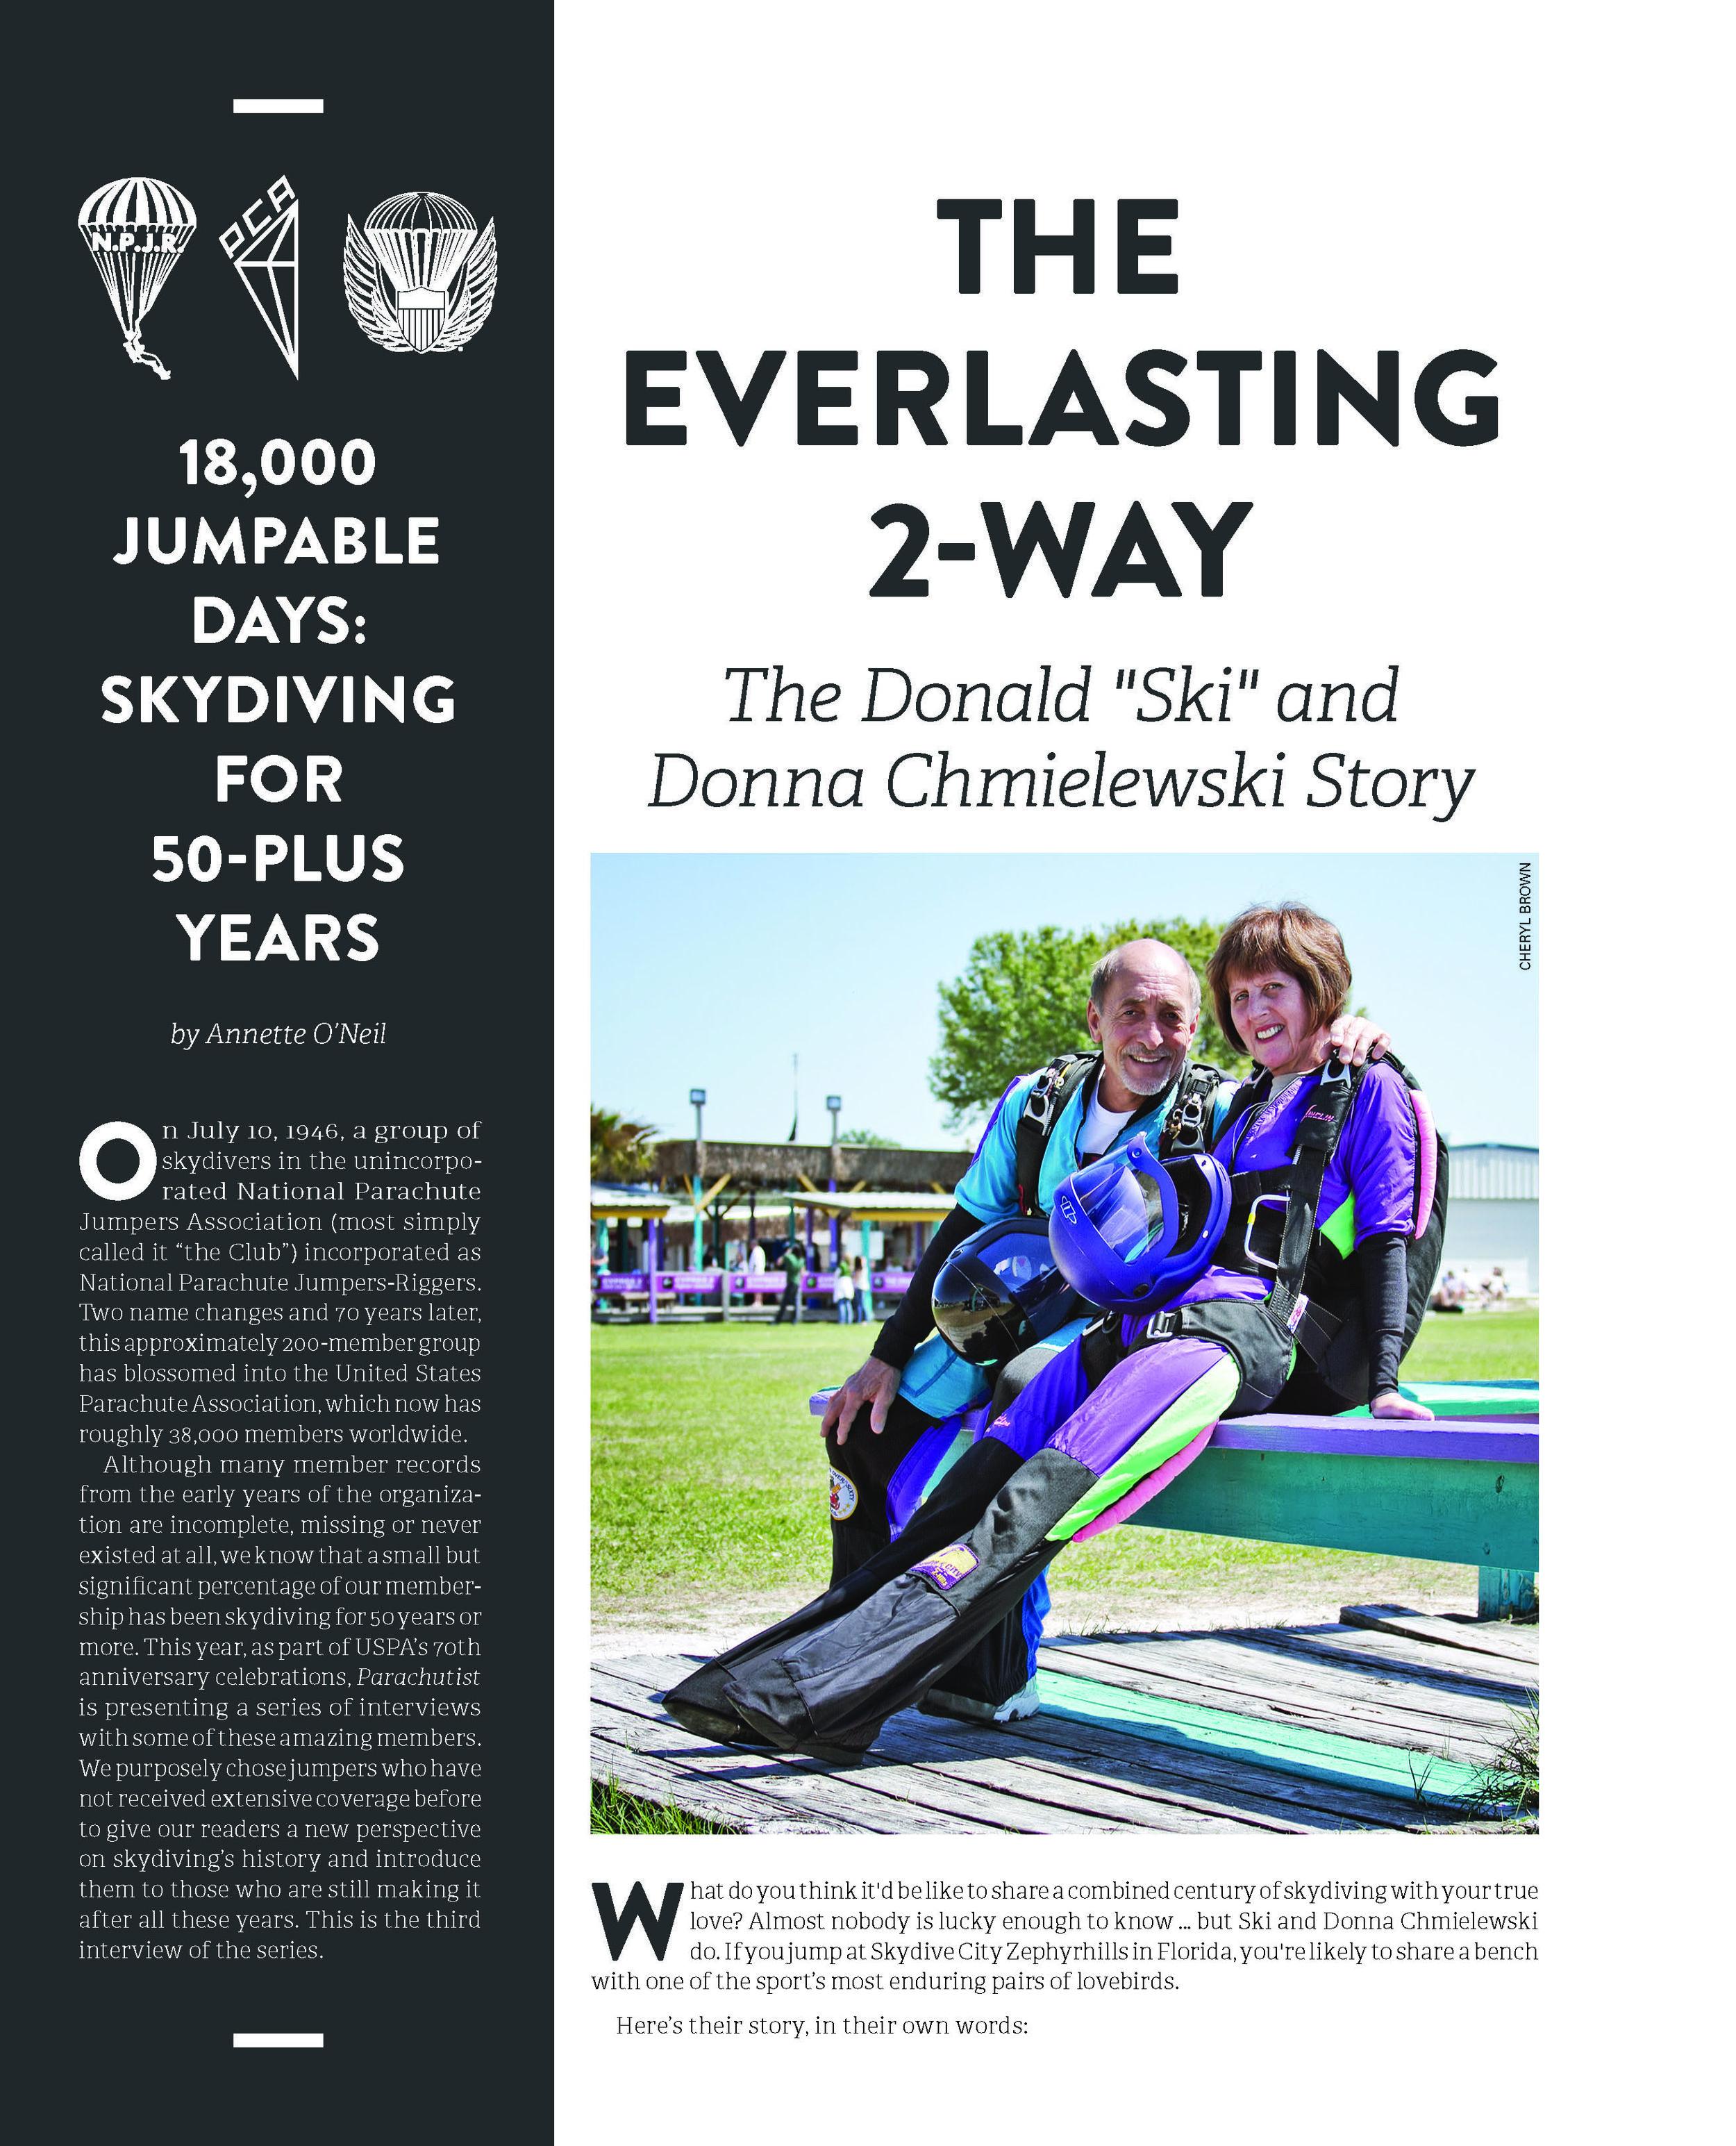 18,000 Jumpable Days: The Everlasting 2-Way